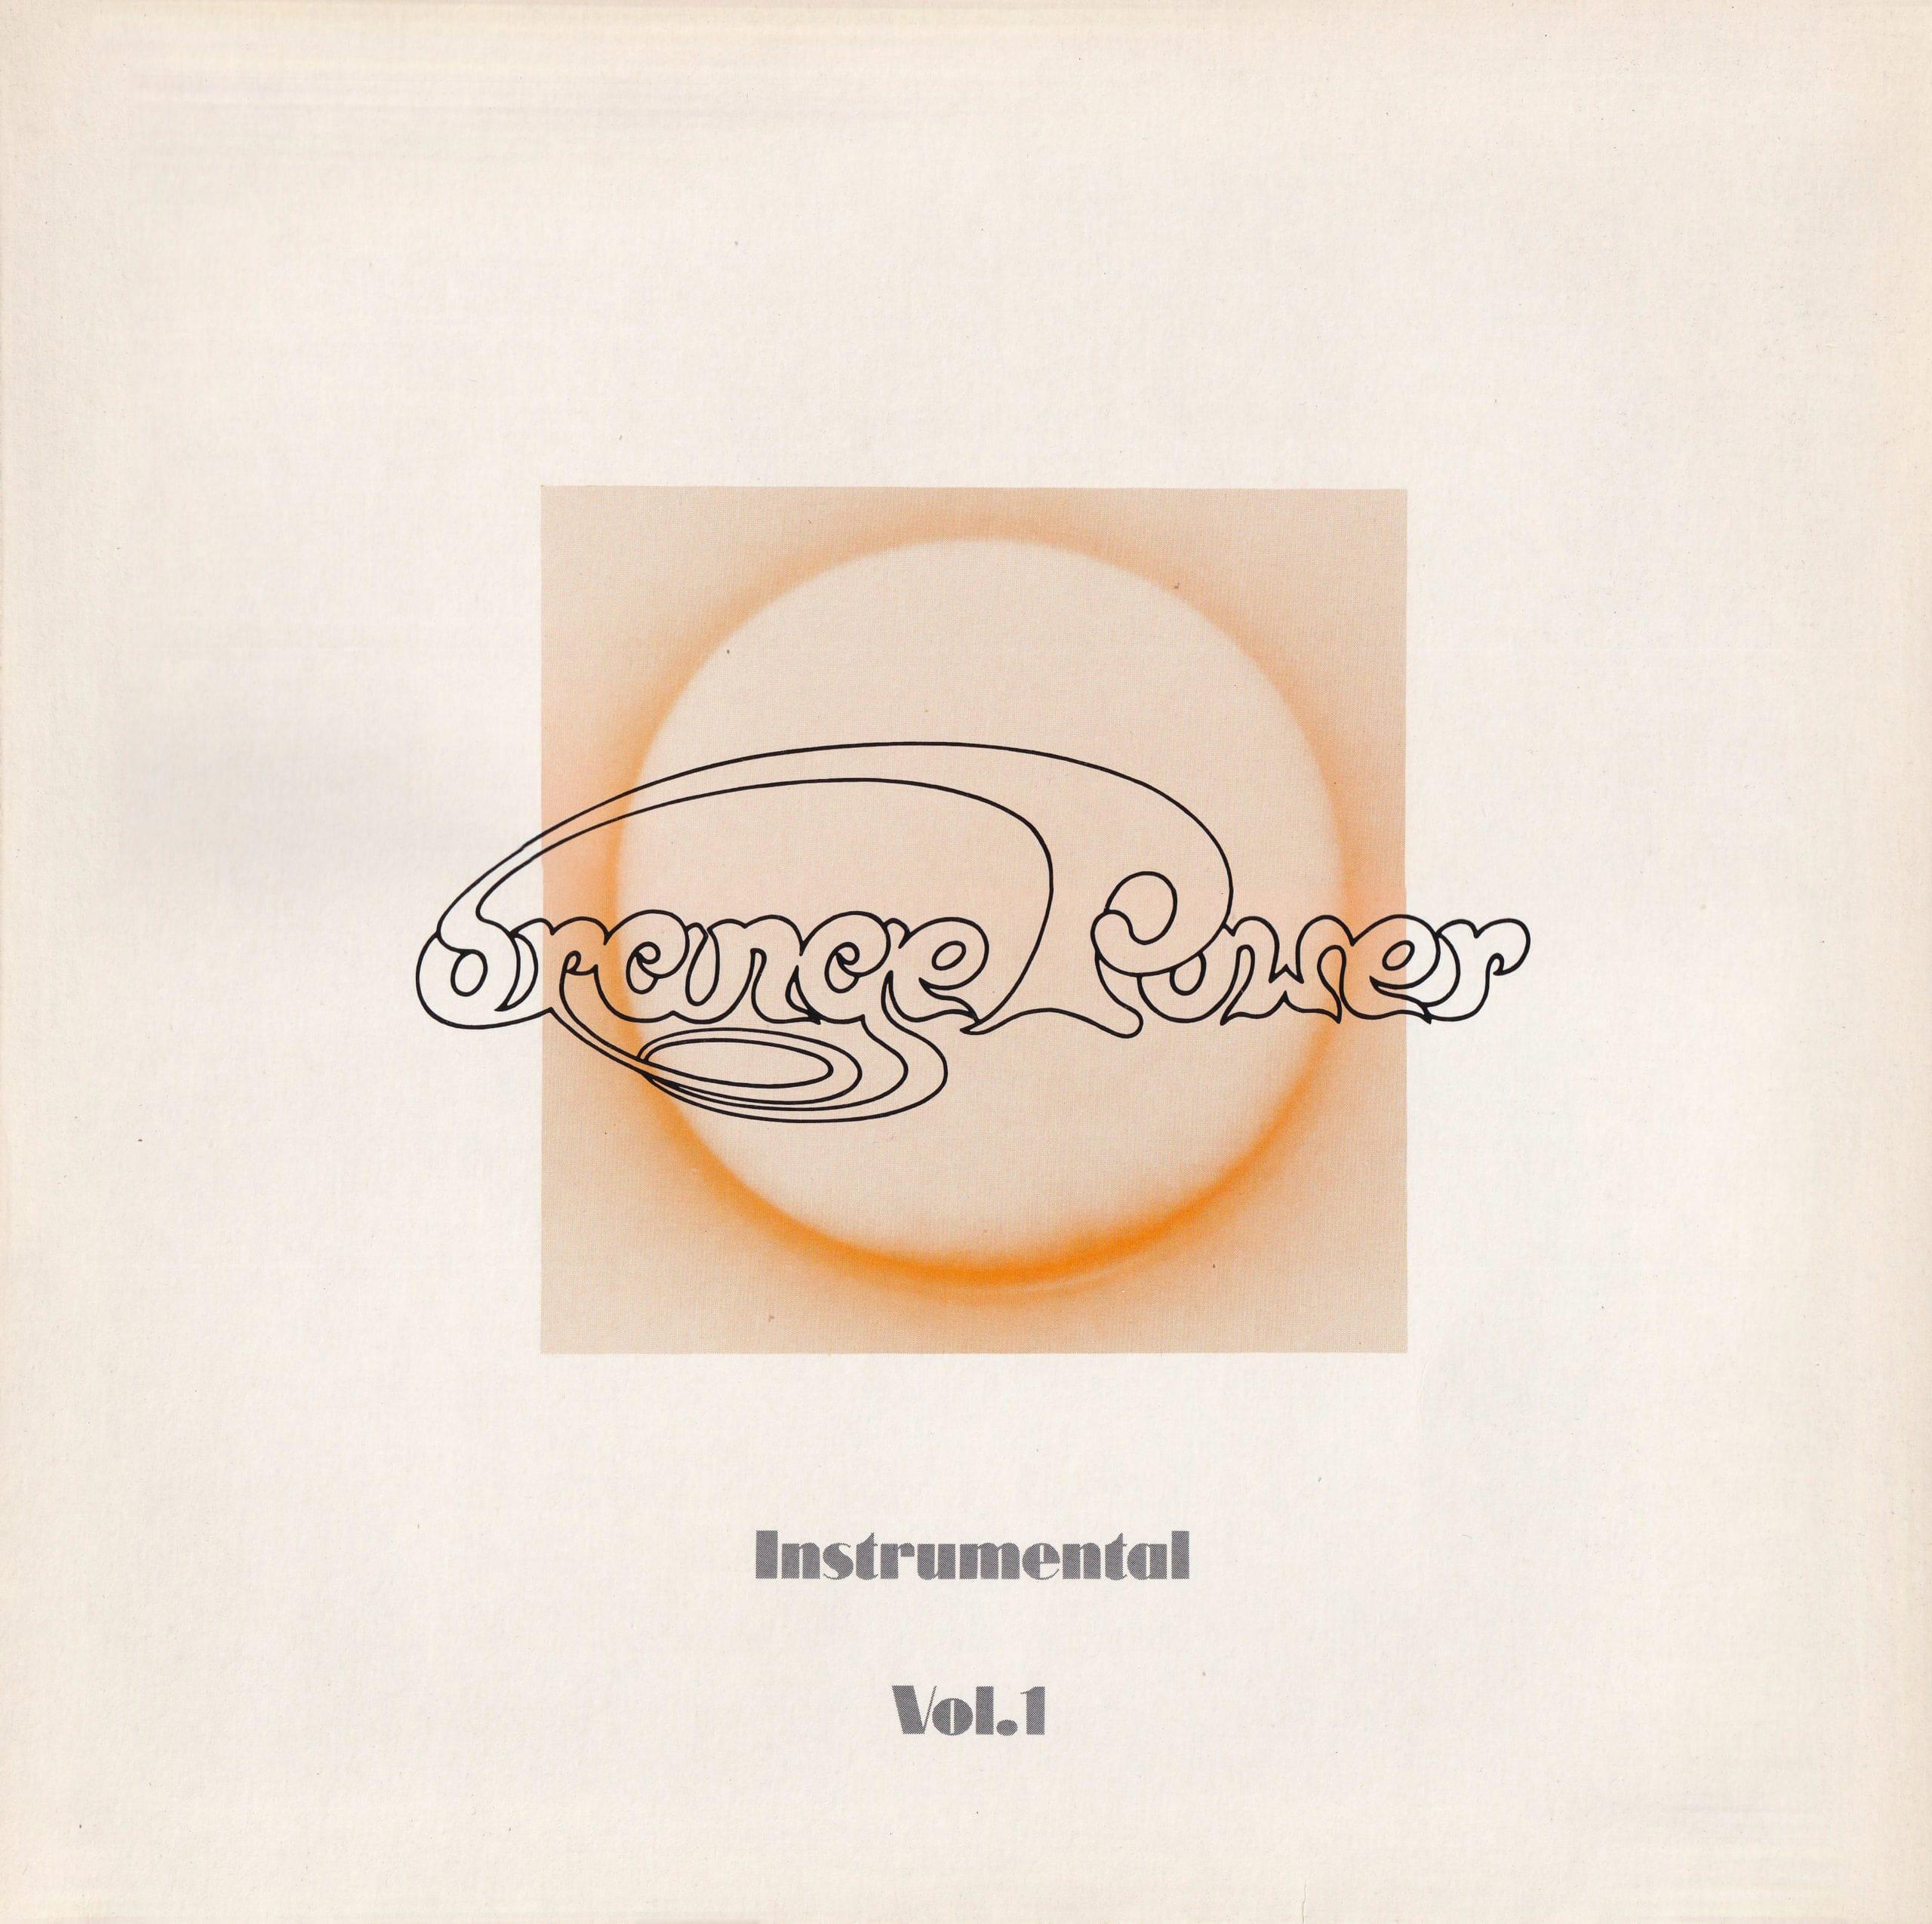 Instrumental, Vol. 1 – 1